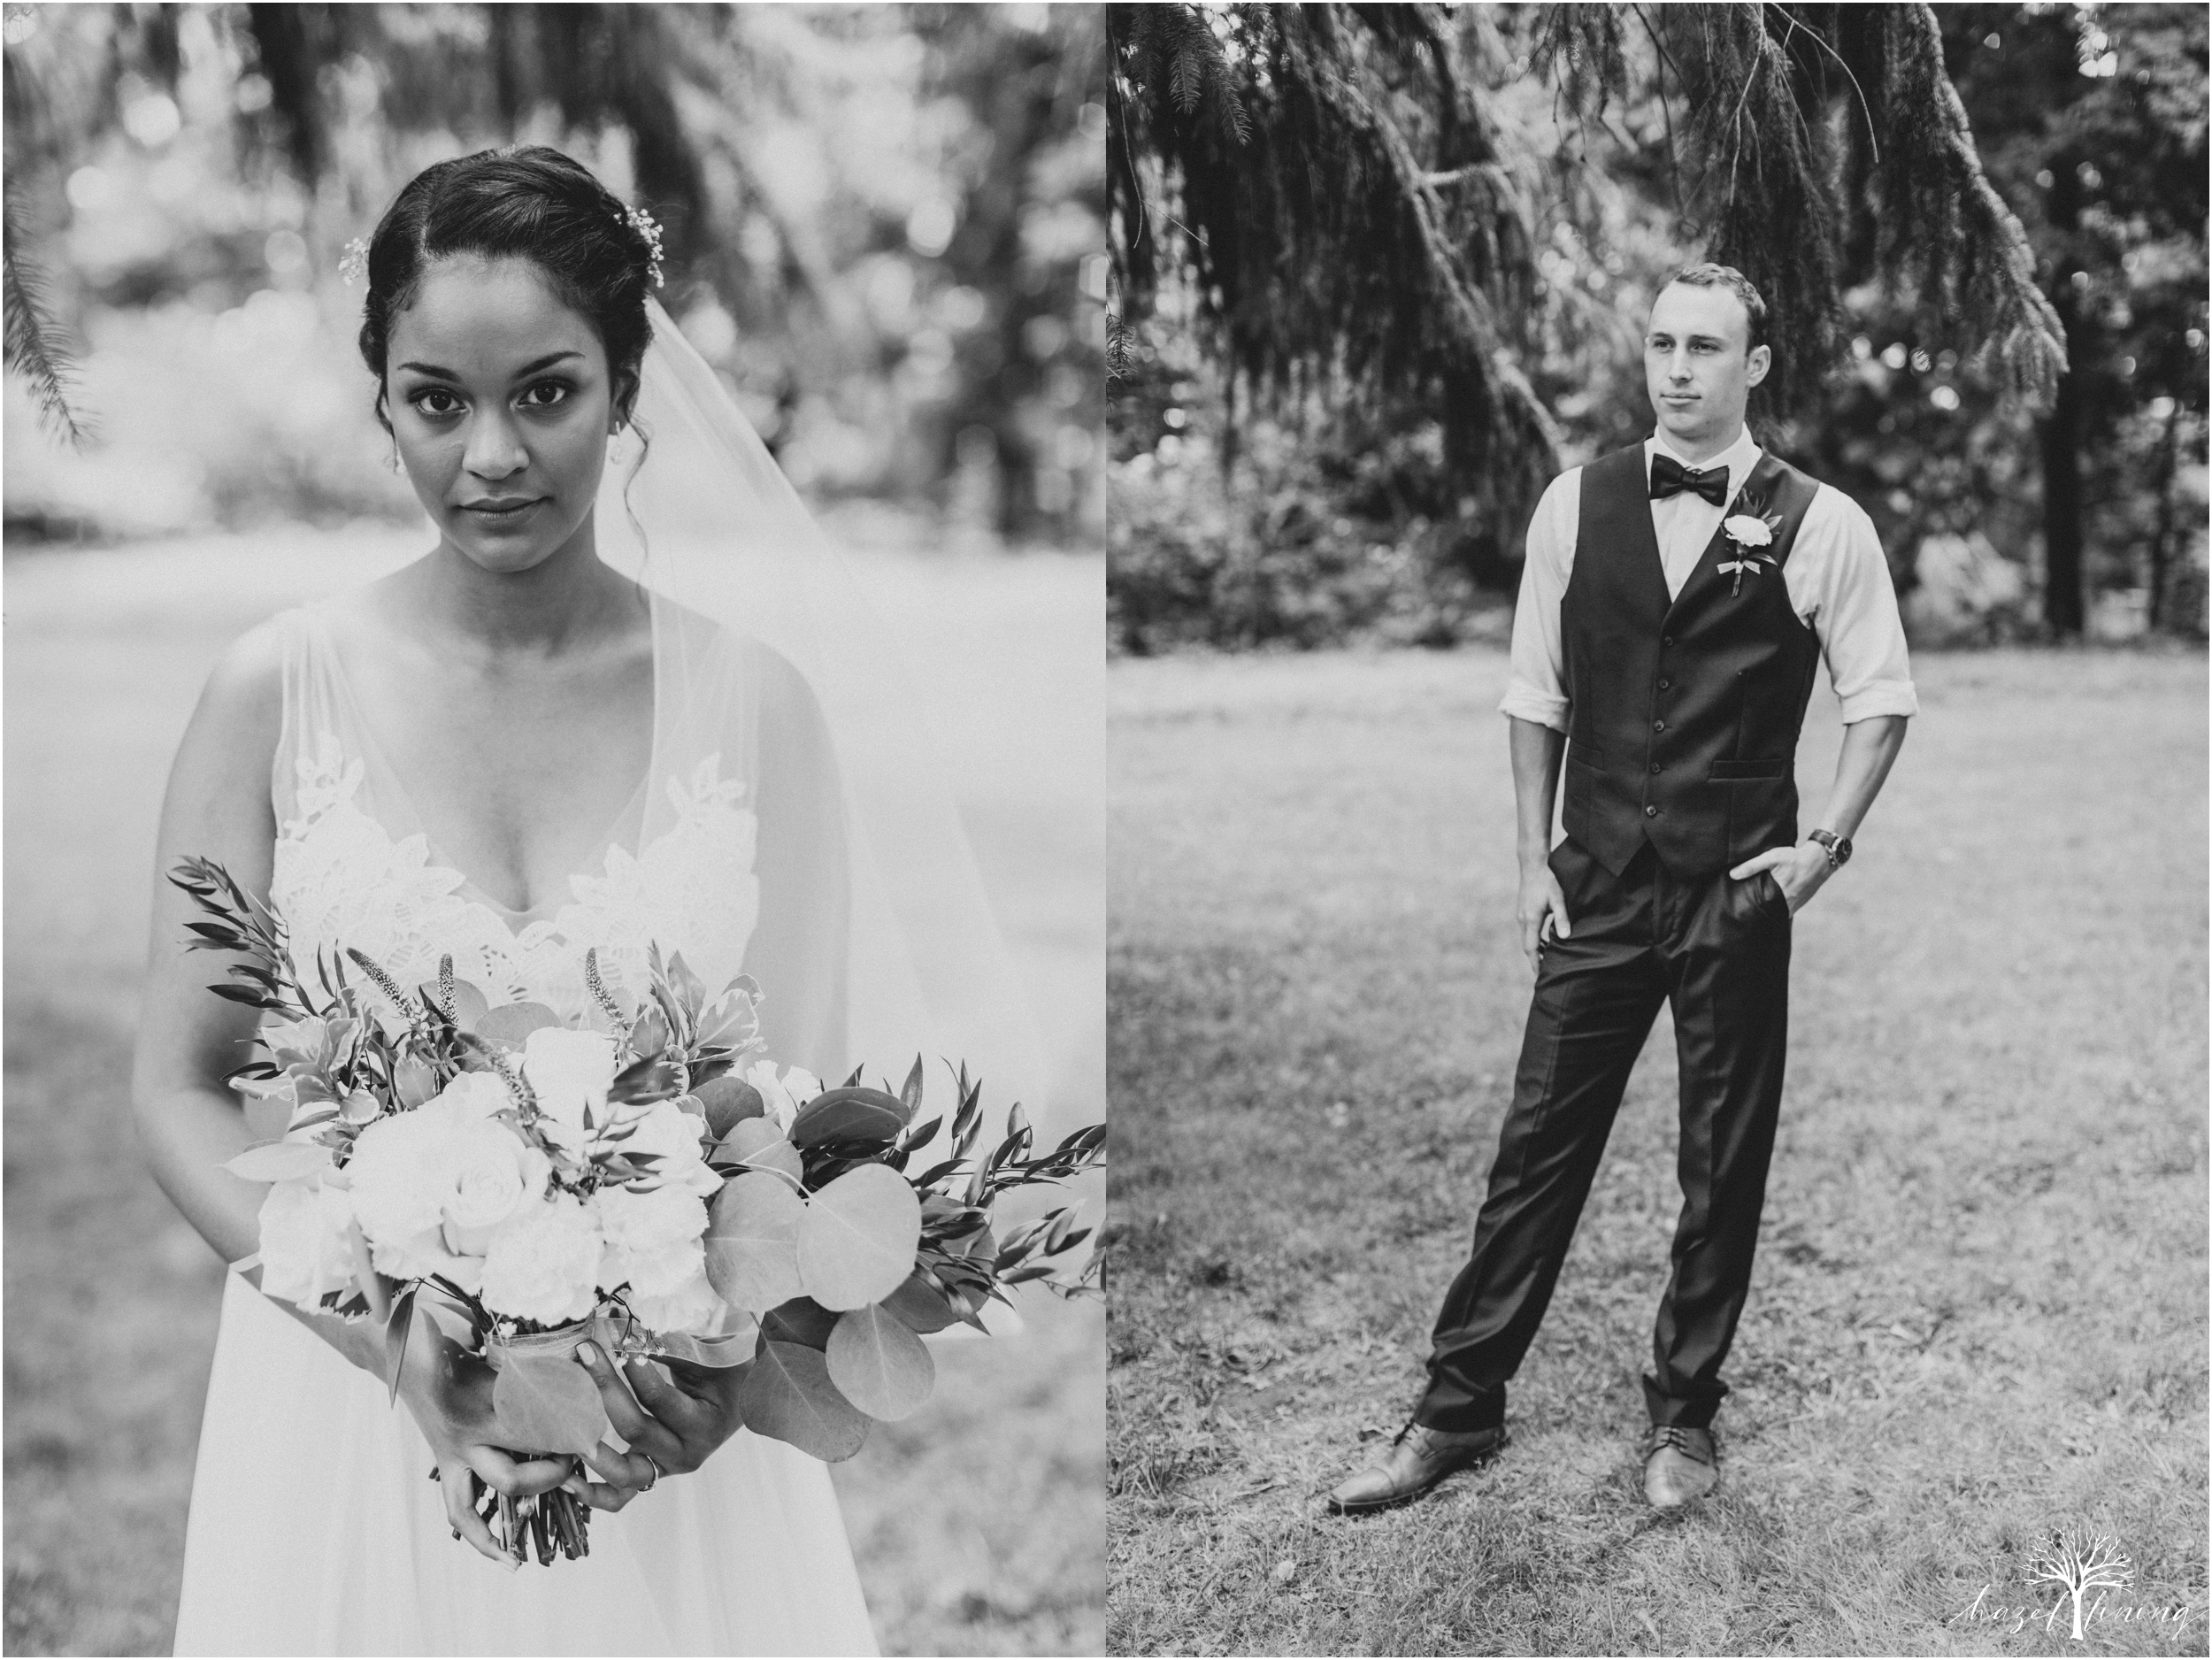 mariah-kreyling-samuel-sherratt-sherrattwiththeworld-peirce-farm-at-witch-hill-boston-massachusetts-wedding-photography-hazel-lining-travel-wedding-elopement-photography_0046.jpg